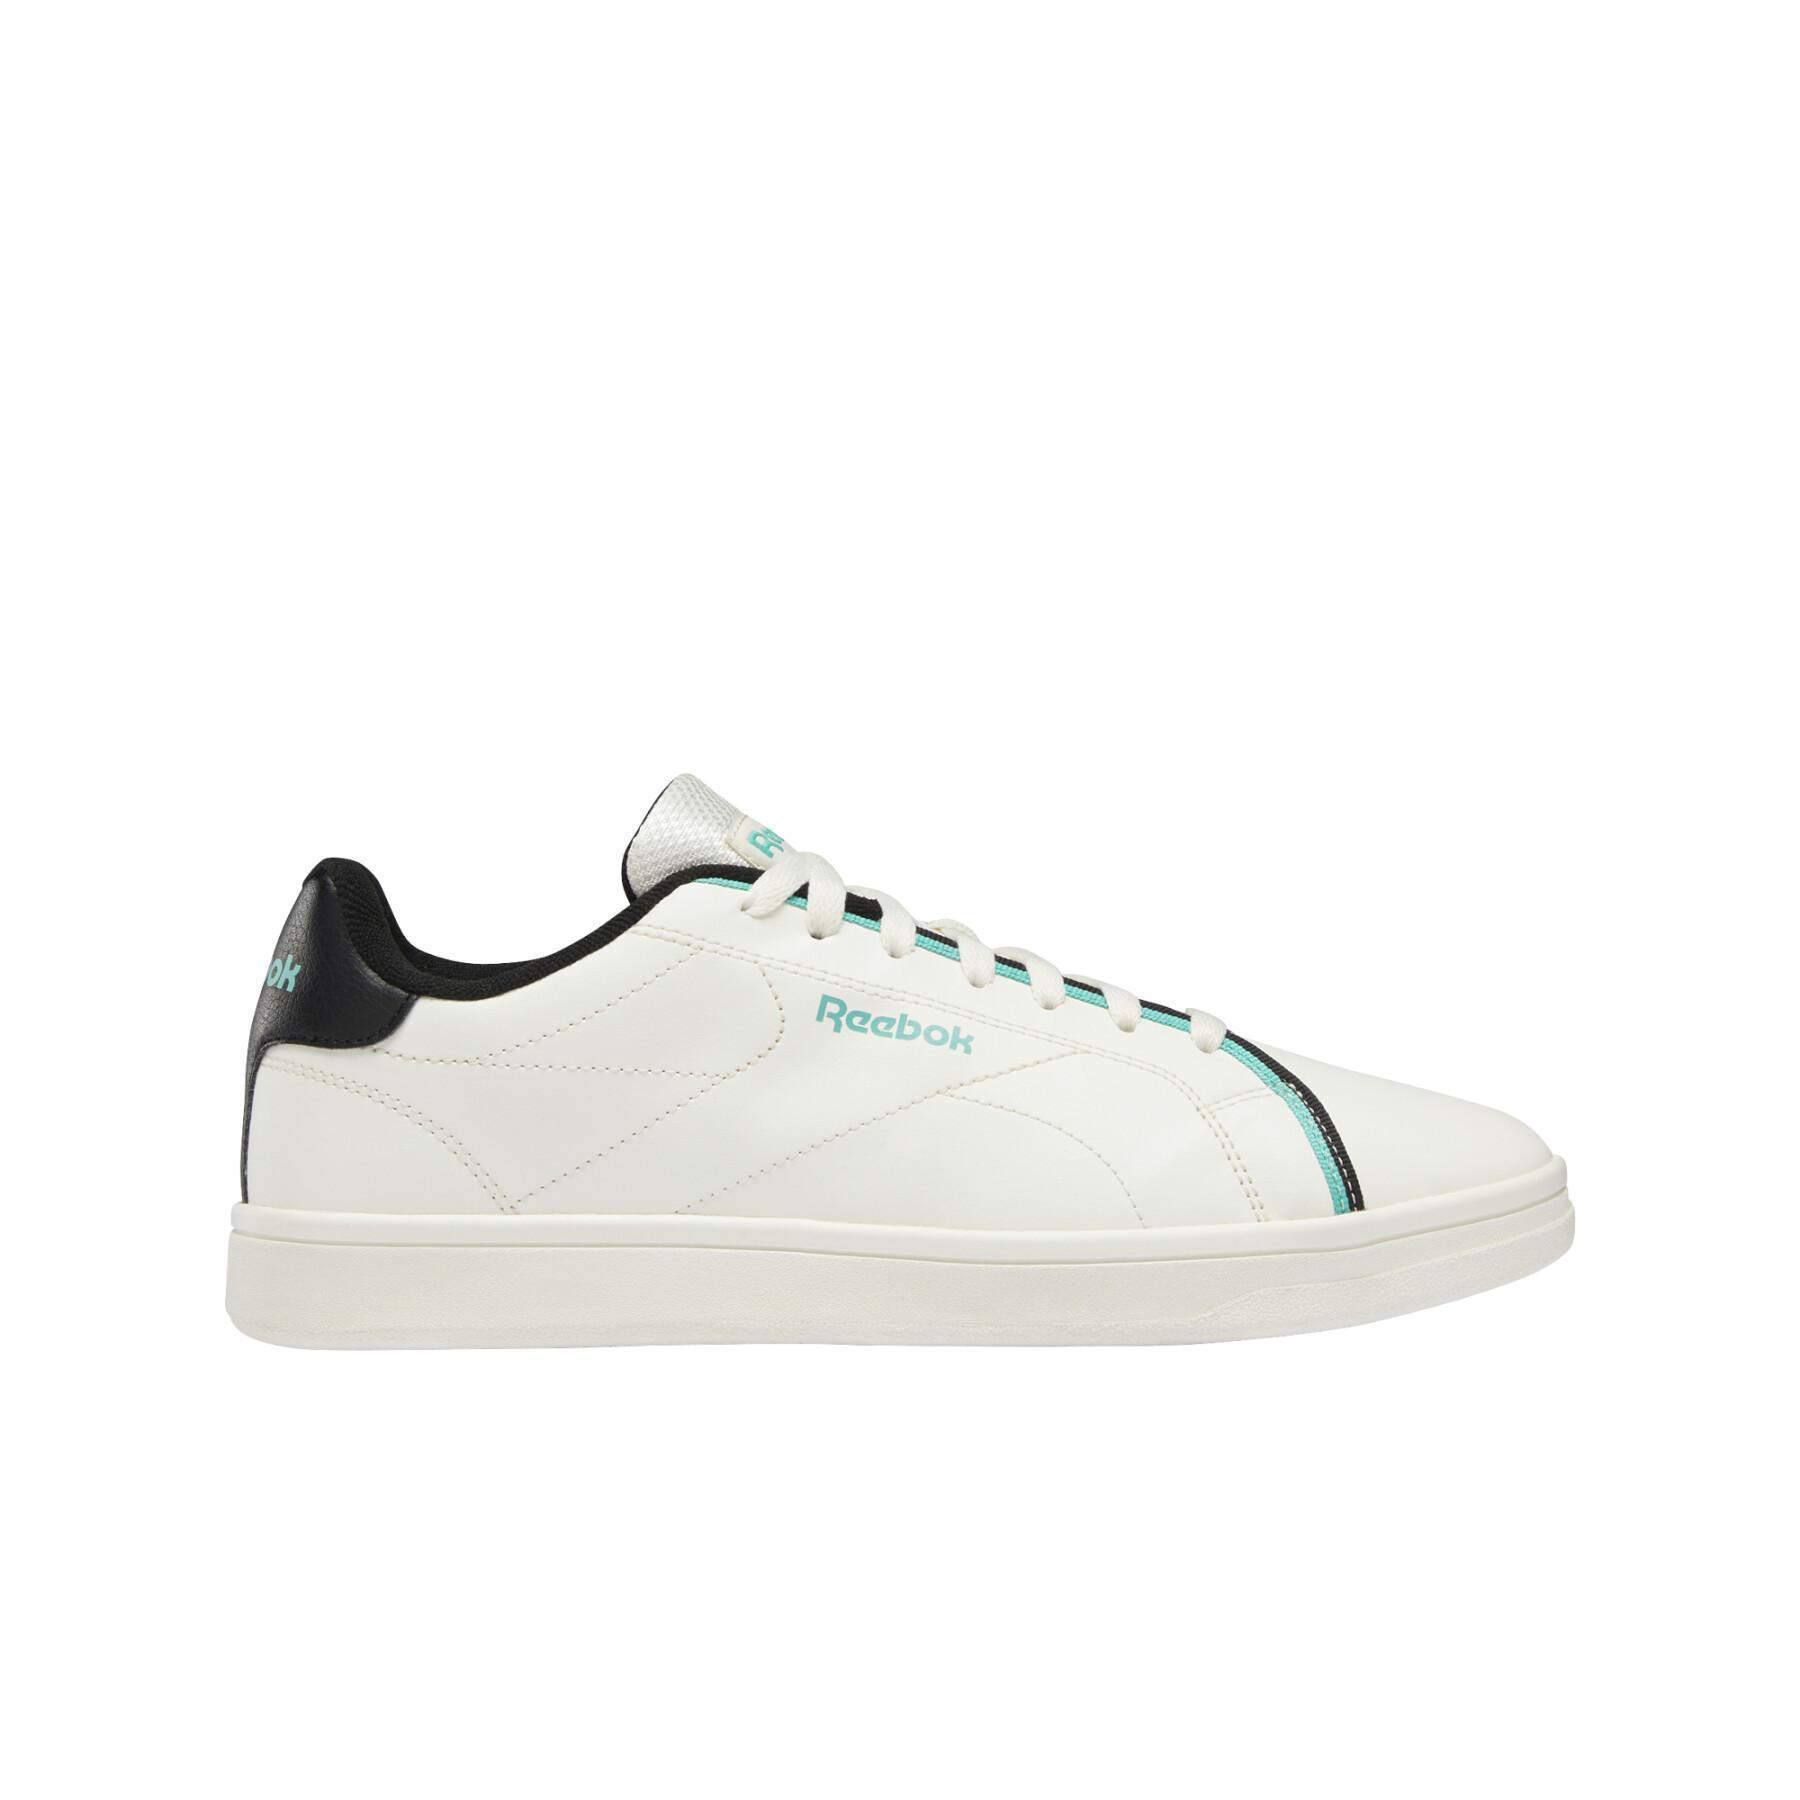 Shoes Reebok Royal Complete 2